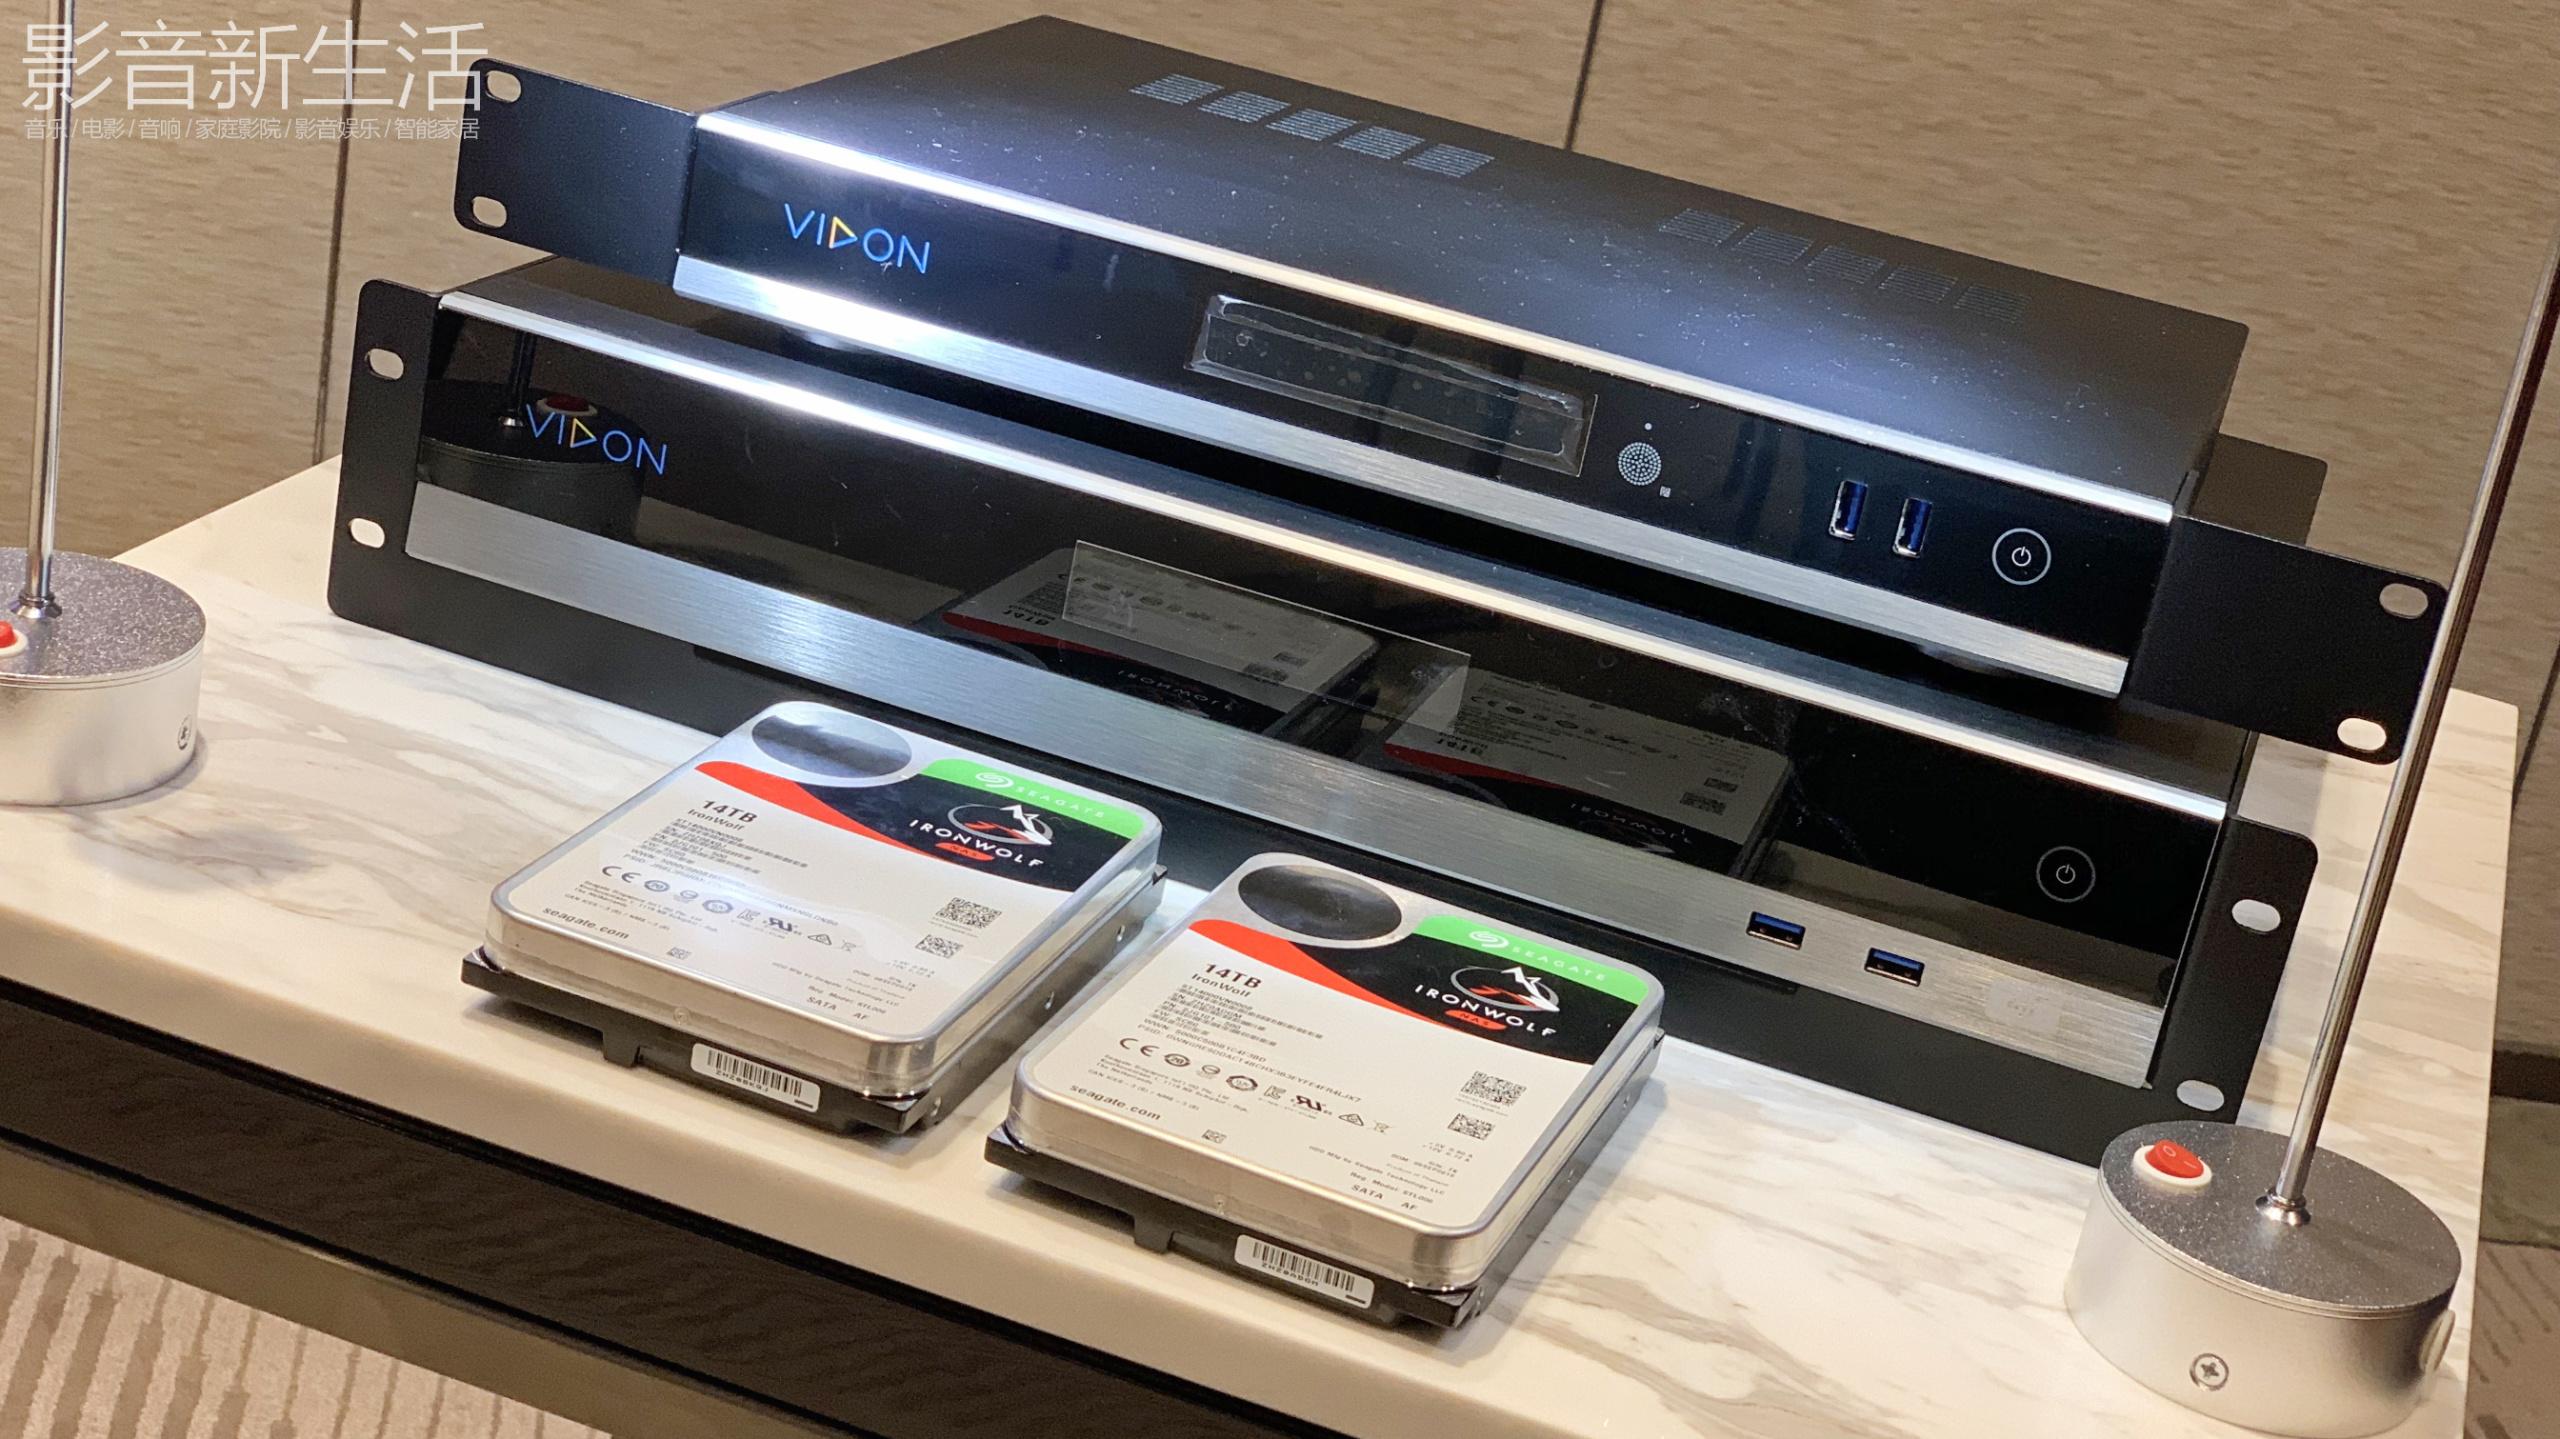 "VIDON V20 UHD HDR 14 - 发布 | ""2019 UHD 超高清影音播放新高度"" VIDON 威动 V20 智能影库发布!"